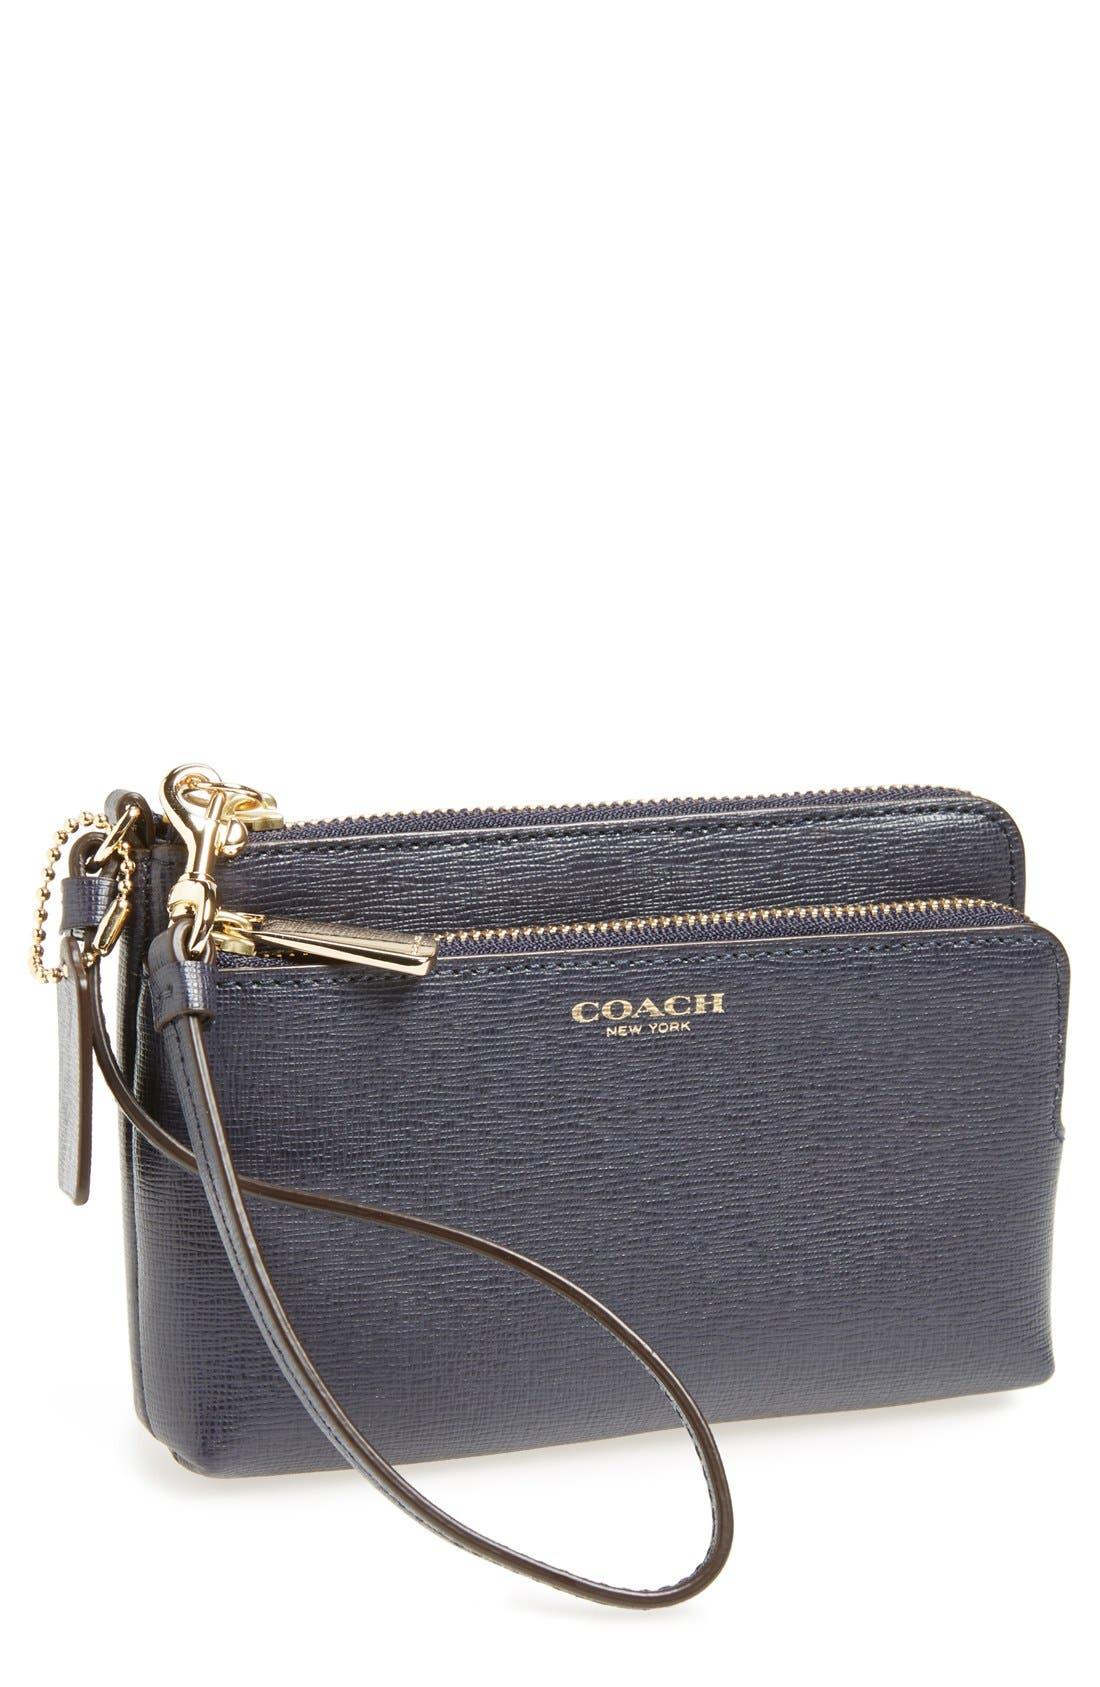 Main Image - COACH Saffiano Leather Phone Wristlet